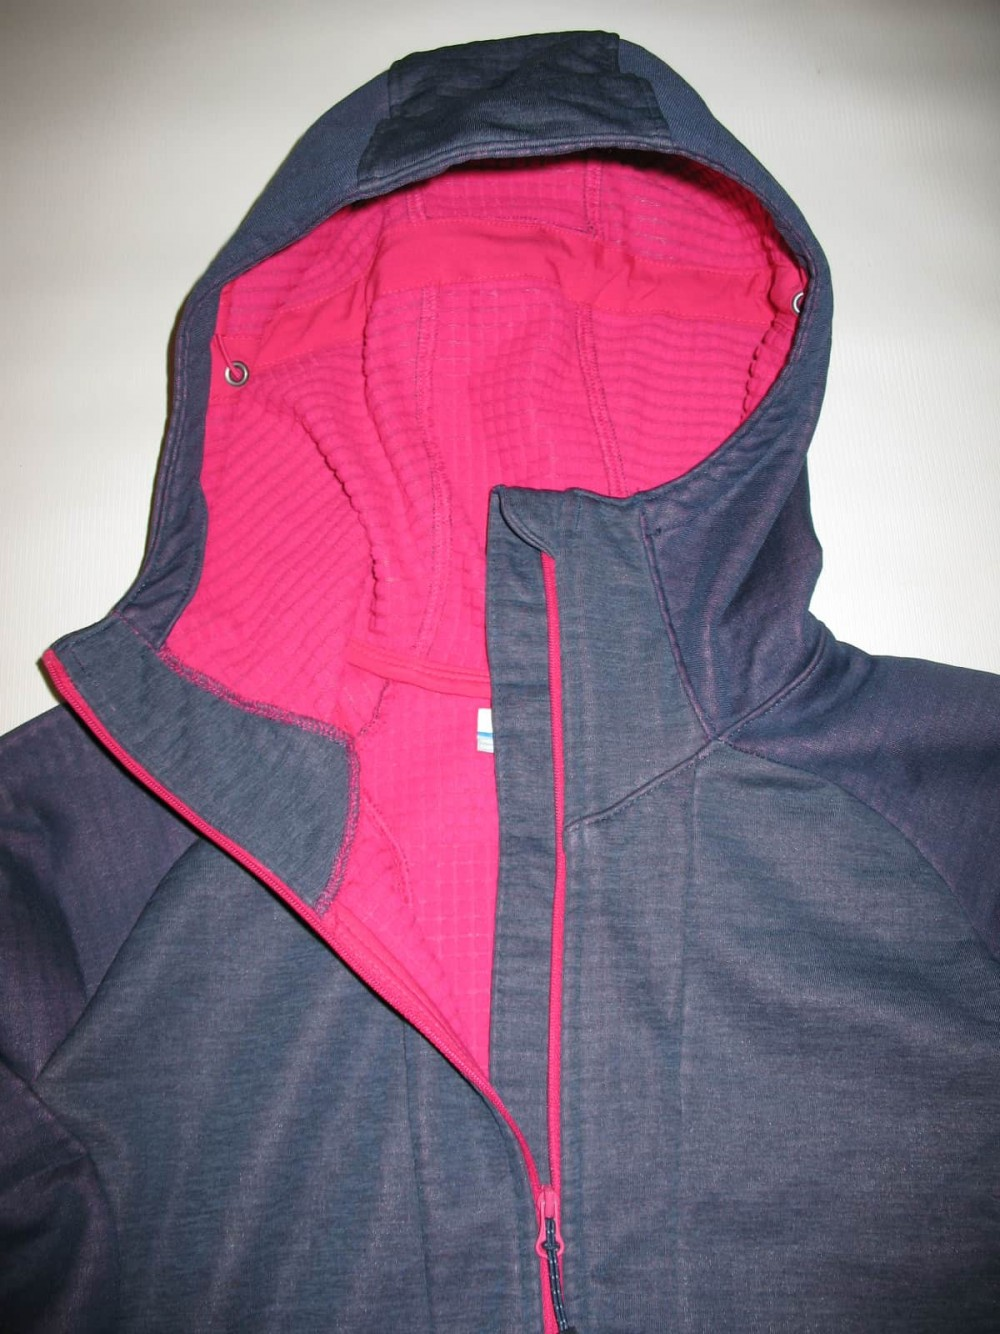 Куртка COLUMBIA steel cliff hooded softshell jacket lady (размер S) - 5